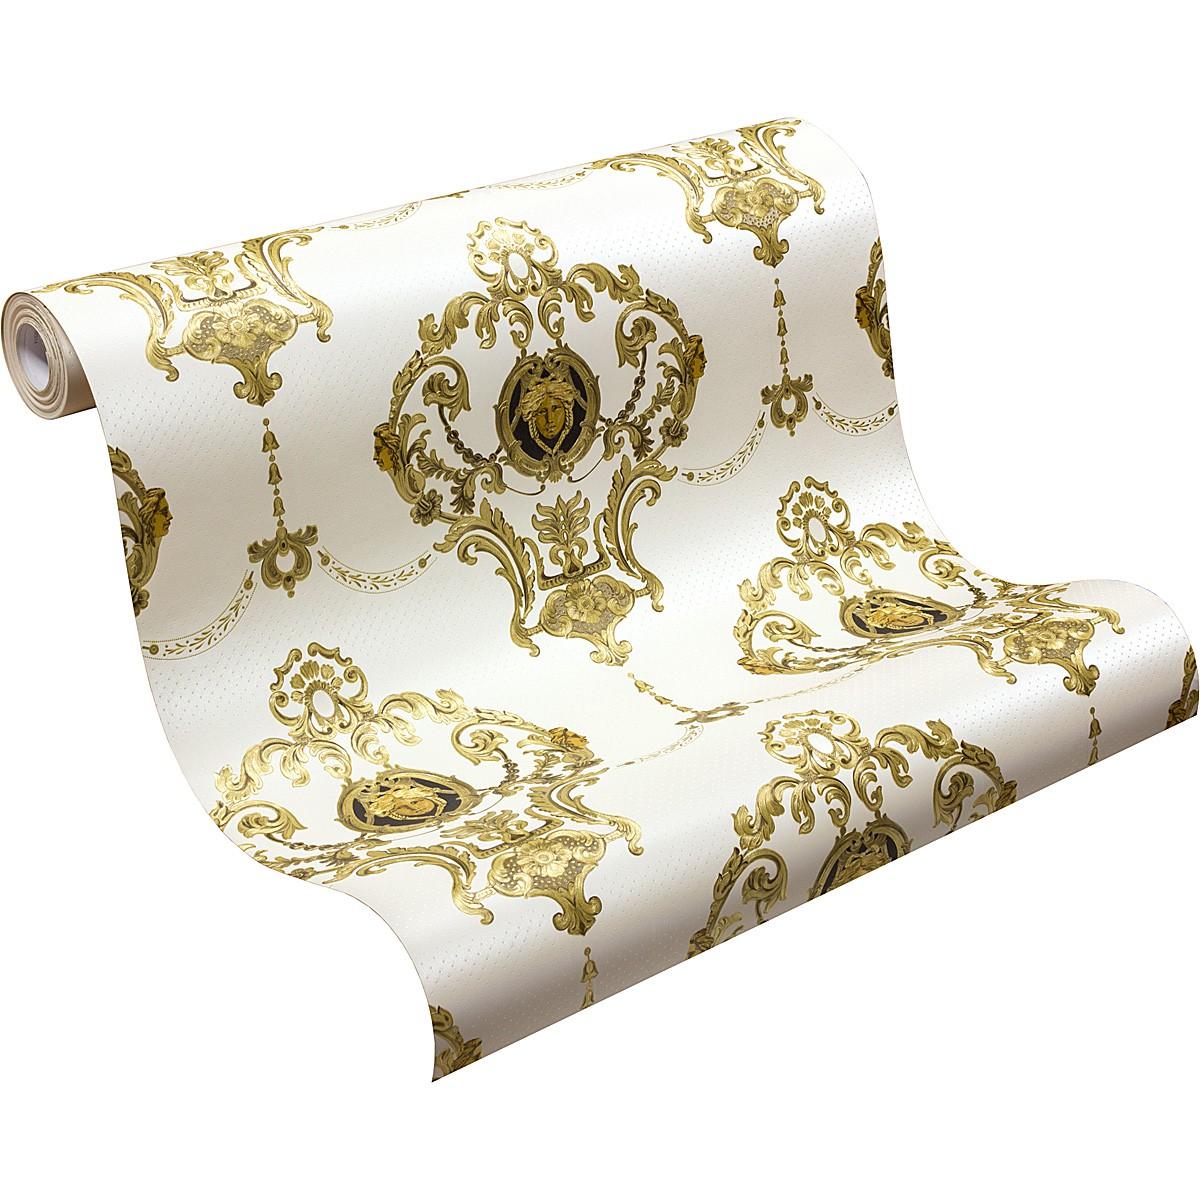 tapete satin barock medusa ornament tapete hermitage glanz wei gold 6553 63 3 ebay. Black Bedroom Furniture Sets. Home Design Ideas